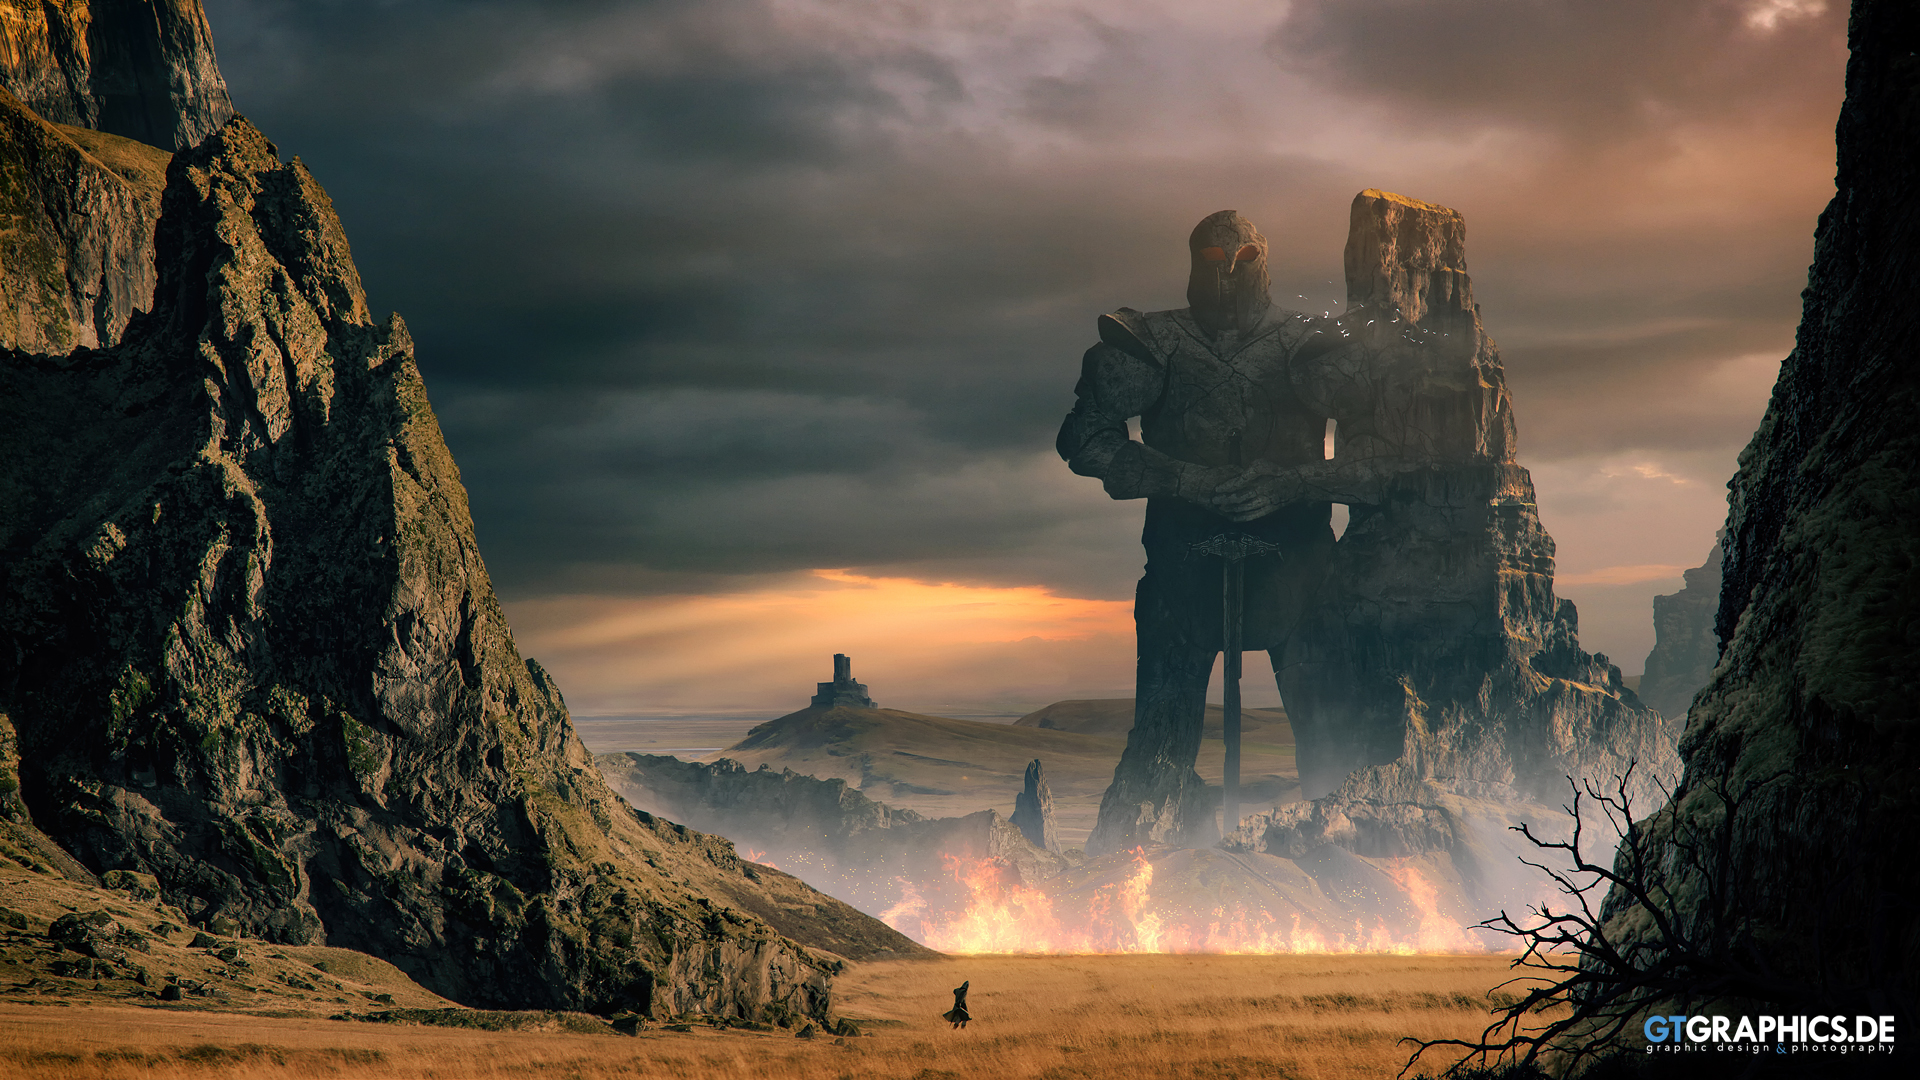 Colossus by TobiasRoetsch